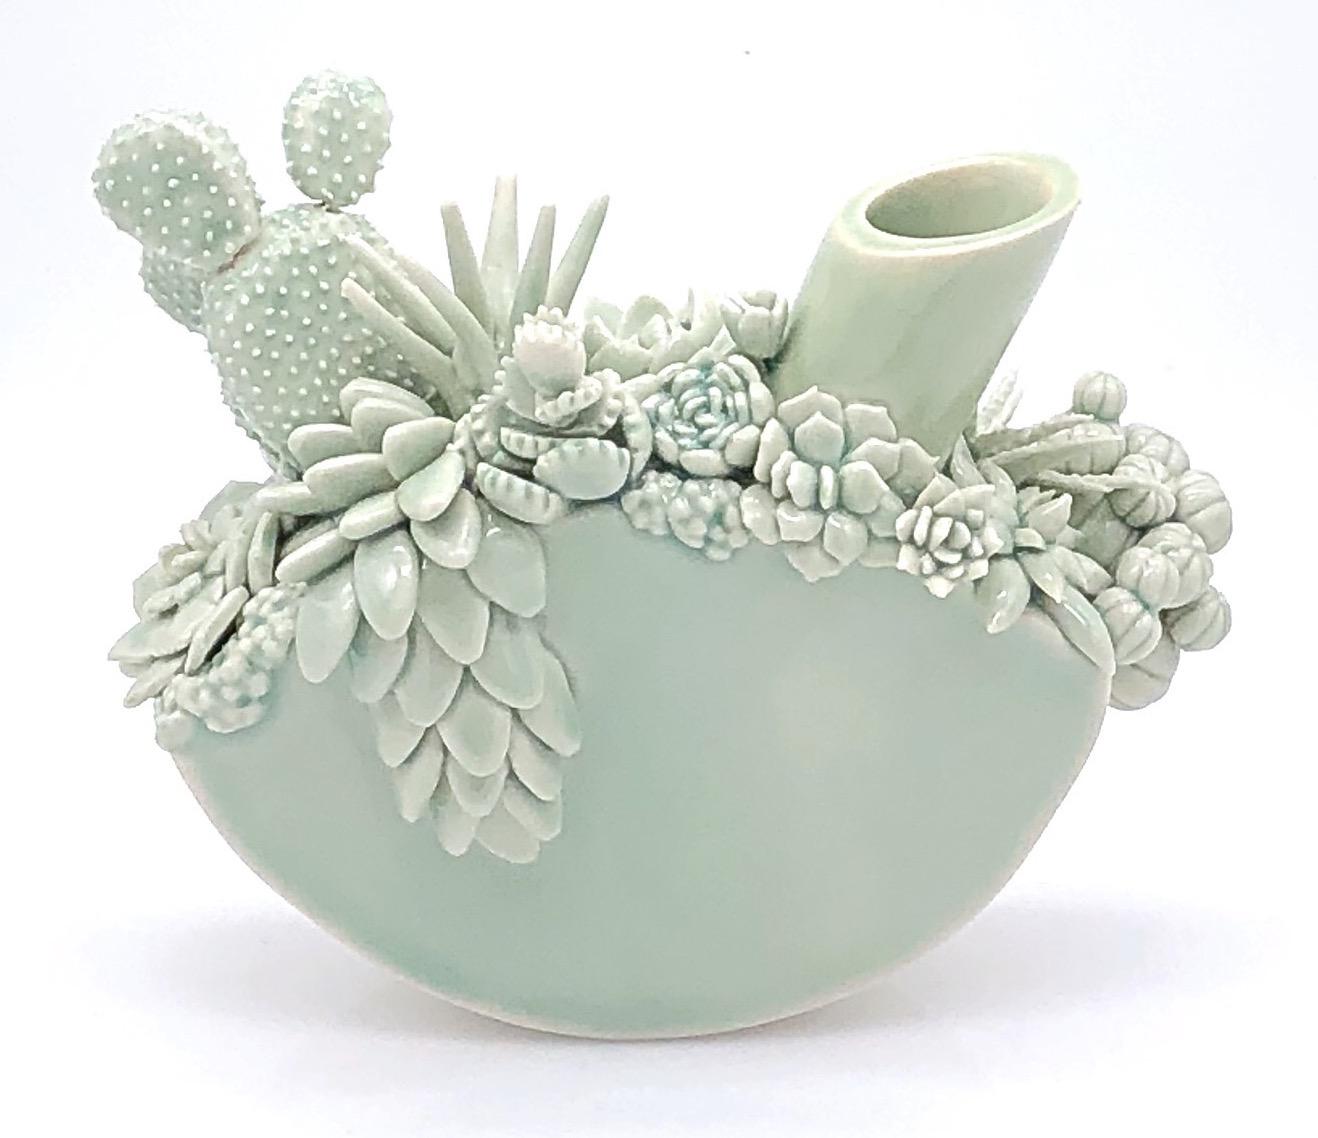 5_Rocking_Vessel_Encrusted_with_Celadon_Succulents.JPG